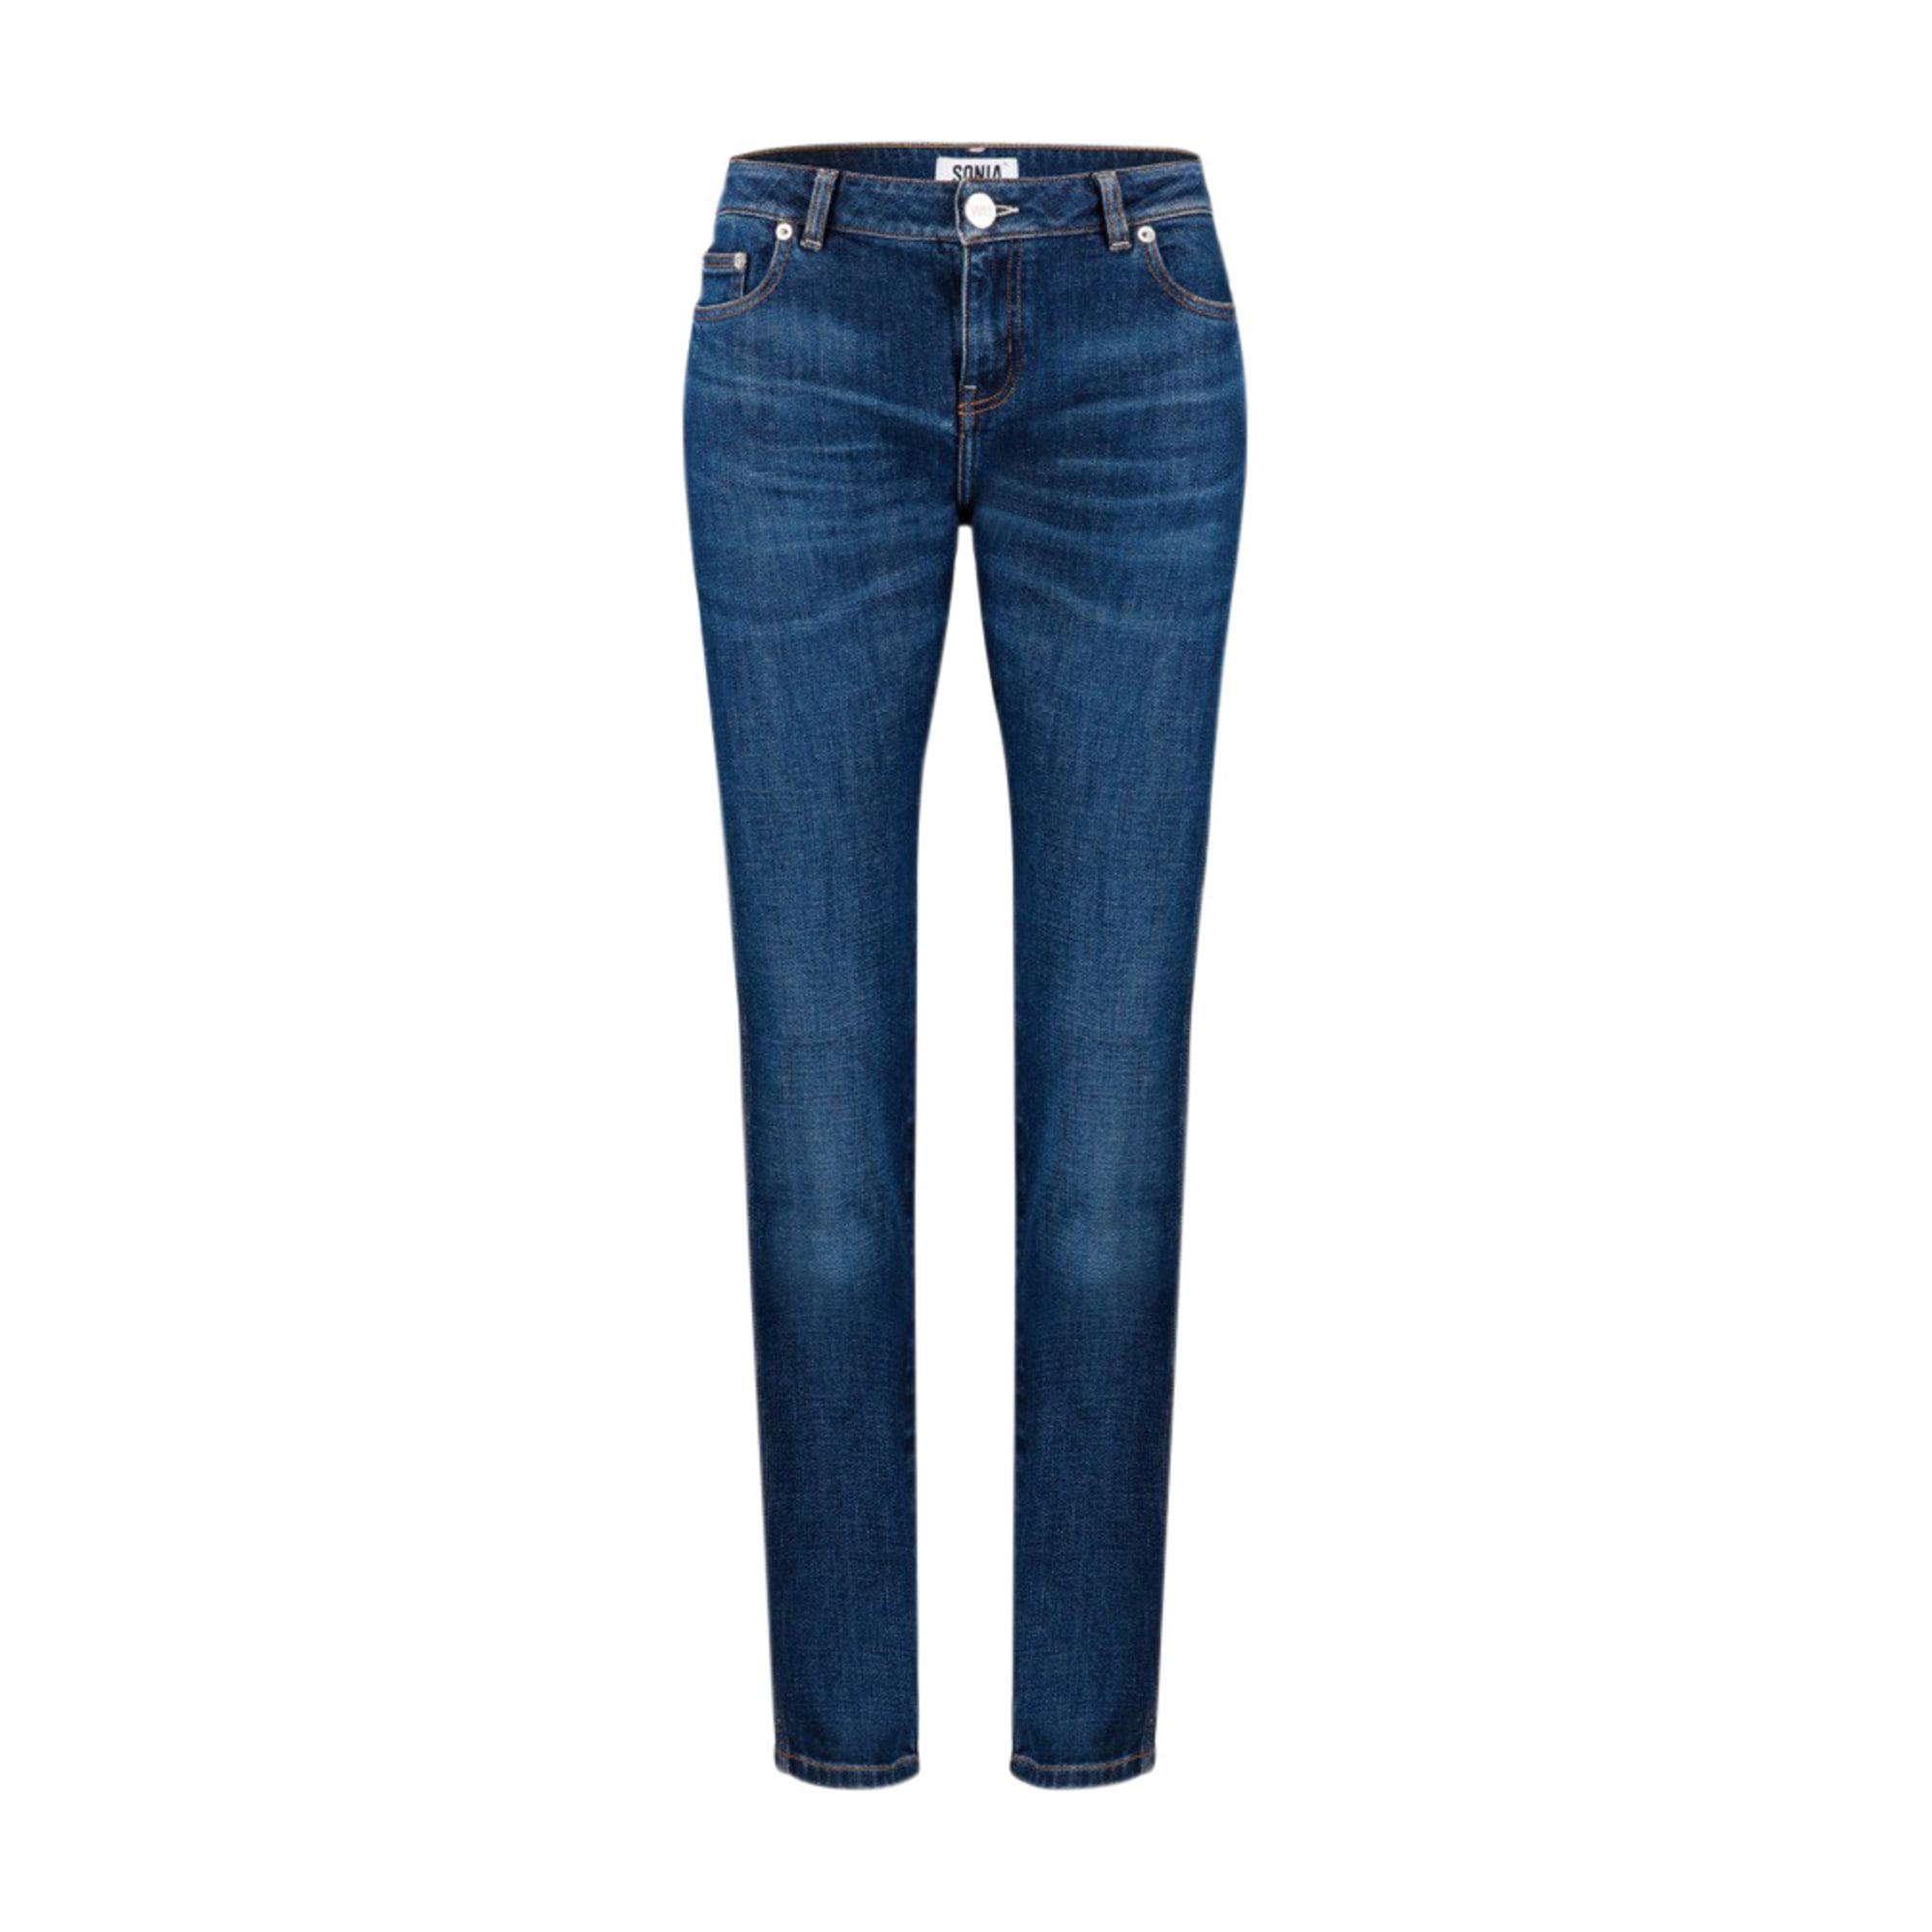 Jeans slim SONIA BY SONIA RYKIEL Bleu, bleu marine, bleu turquoise